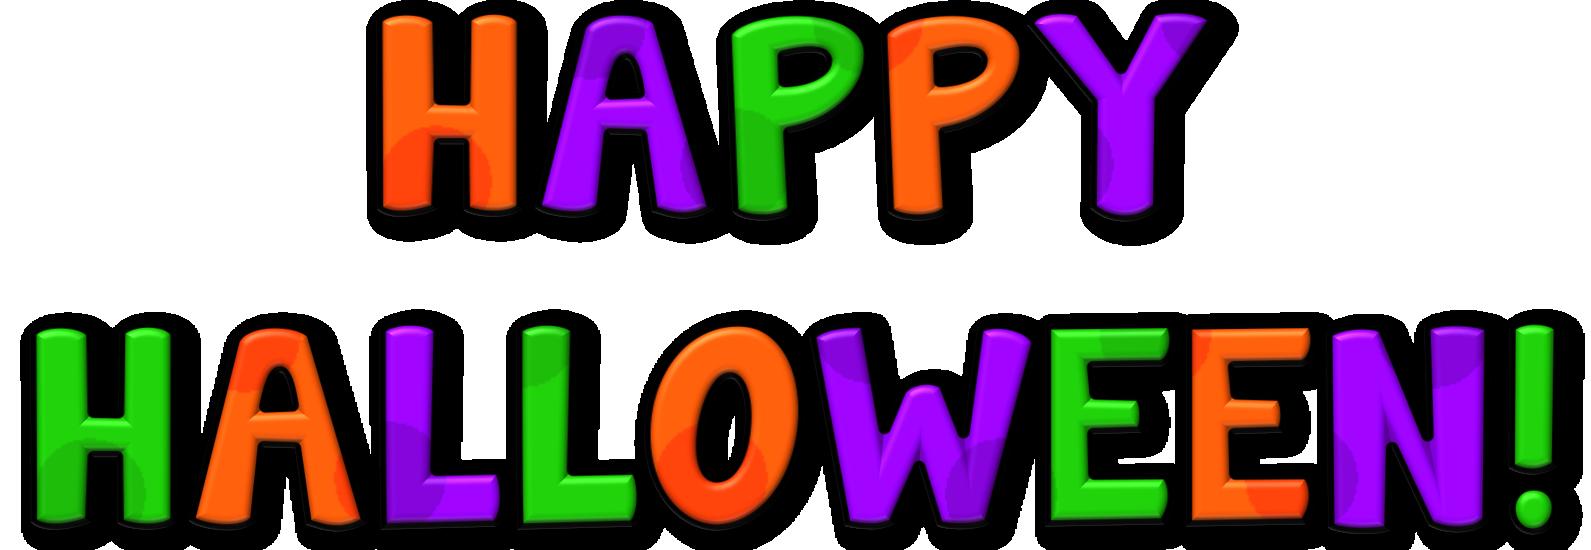 1591x550 halloween happy halloween banner printable free template pdf